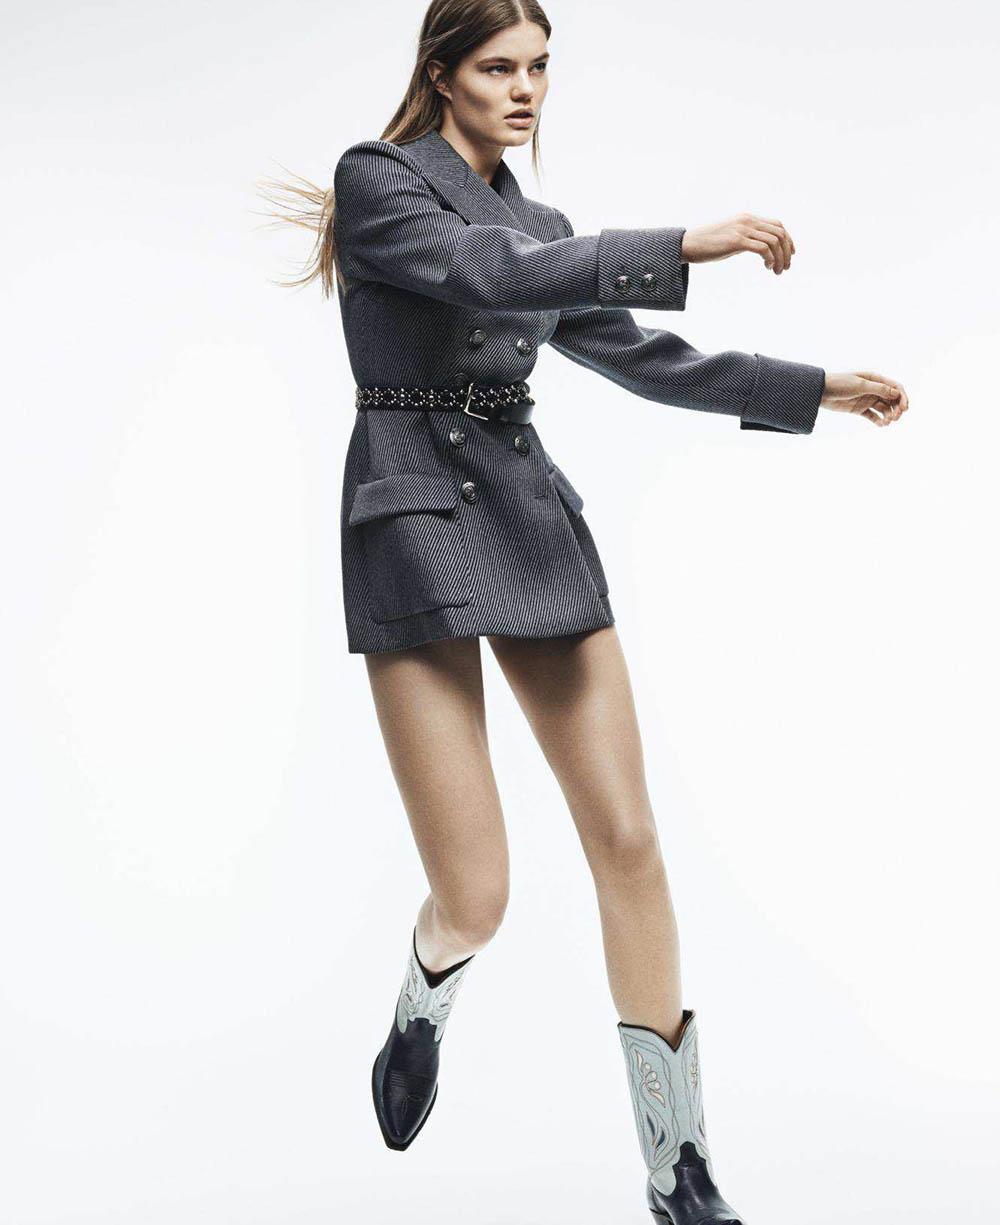 Myrthe Bolt by Tom Schirmacher for Elle US June 2018